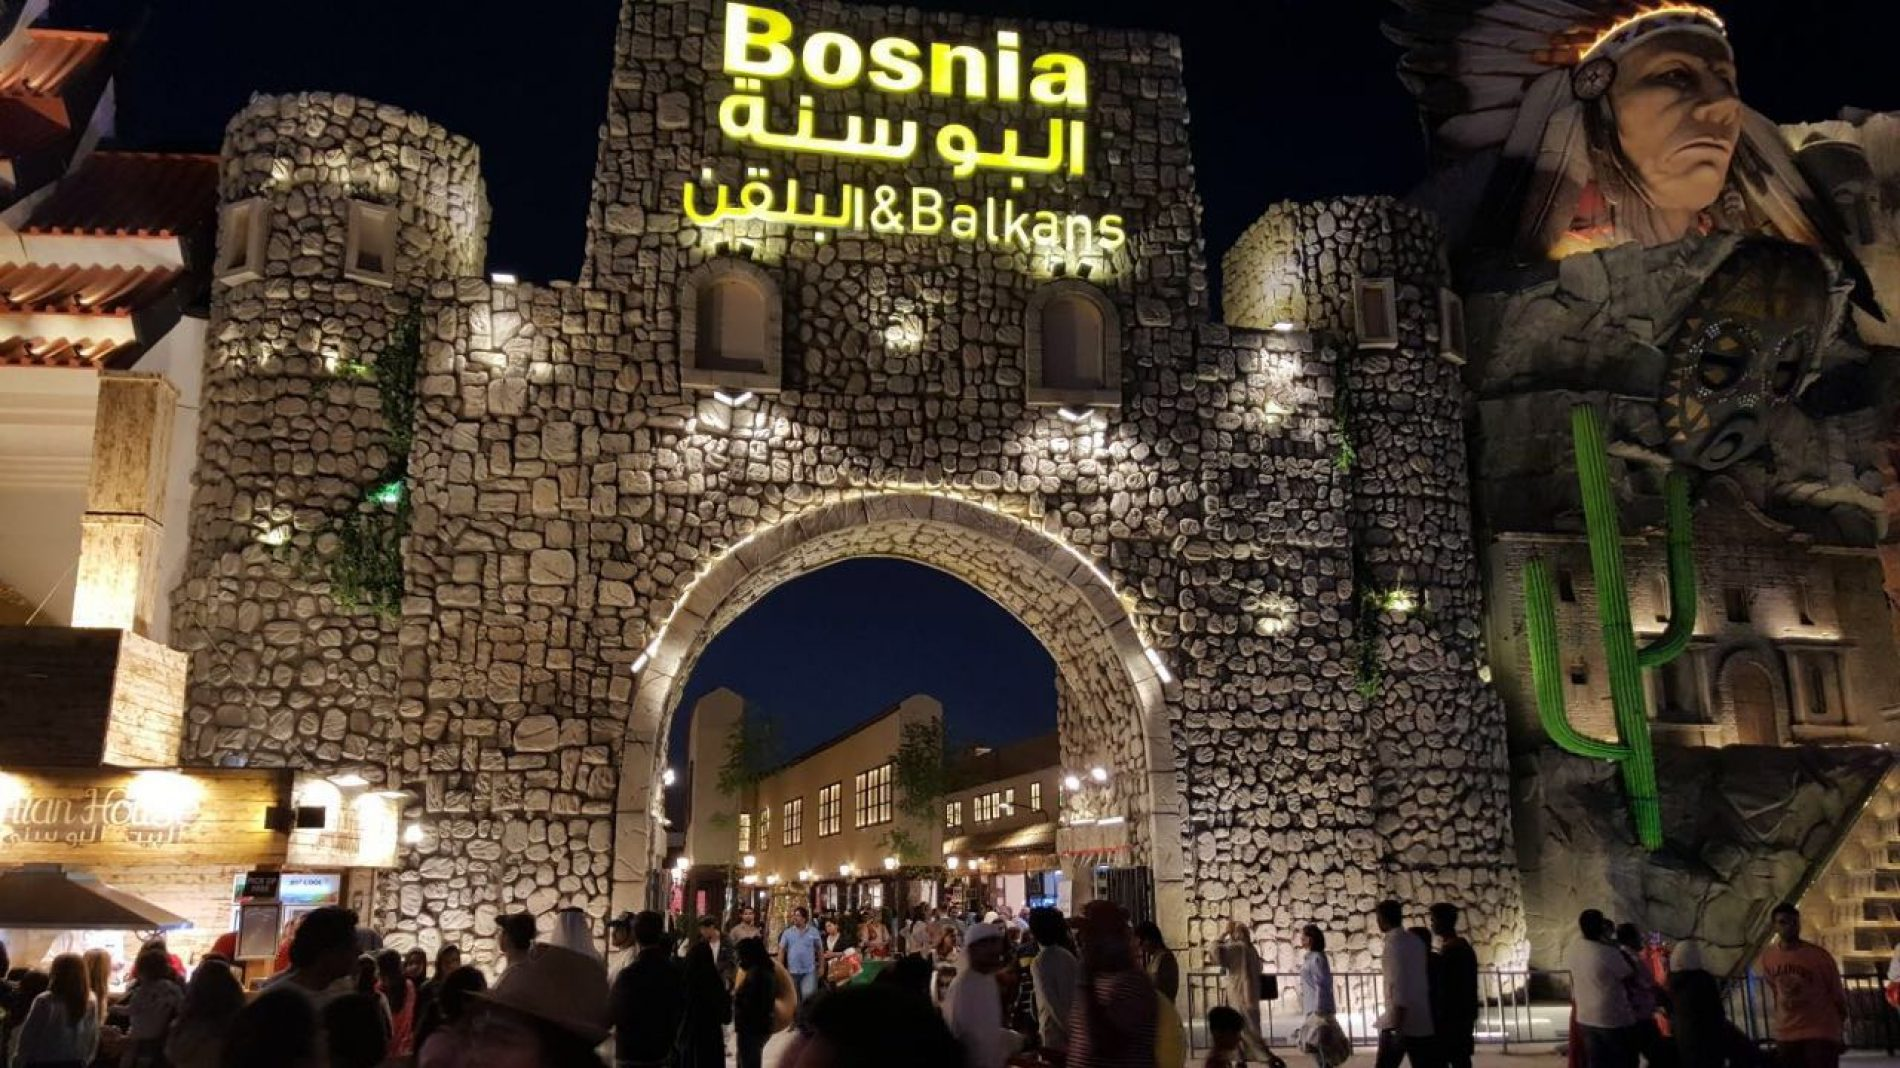 Bosna i Hercegovina na prestižnom Global Village Festivalu u Dubaiju